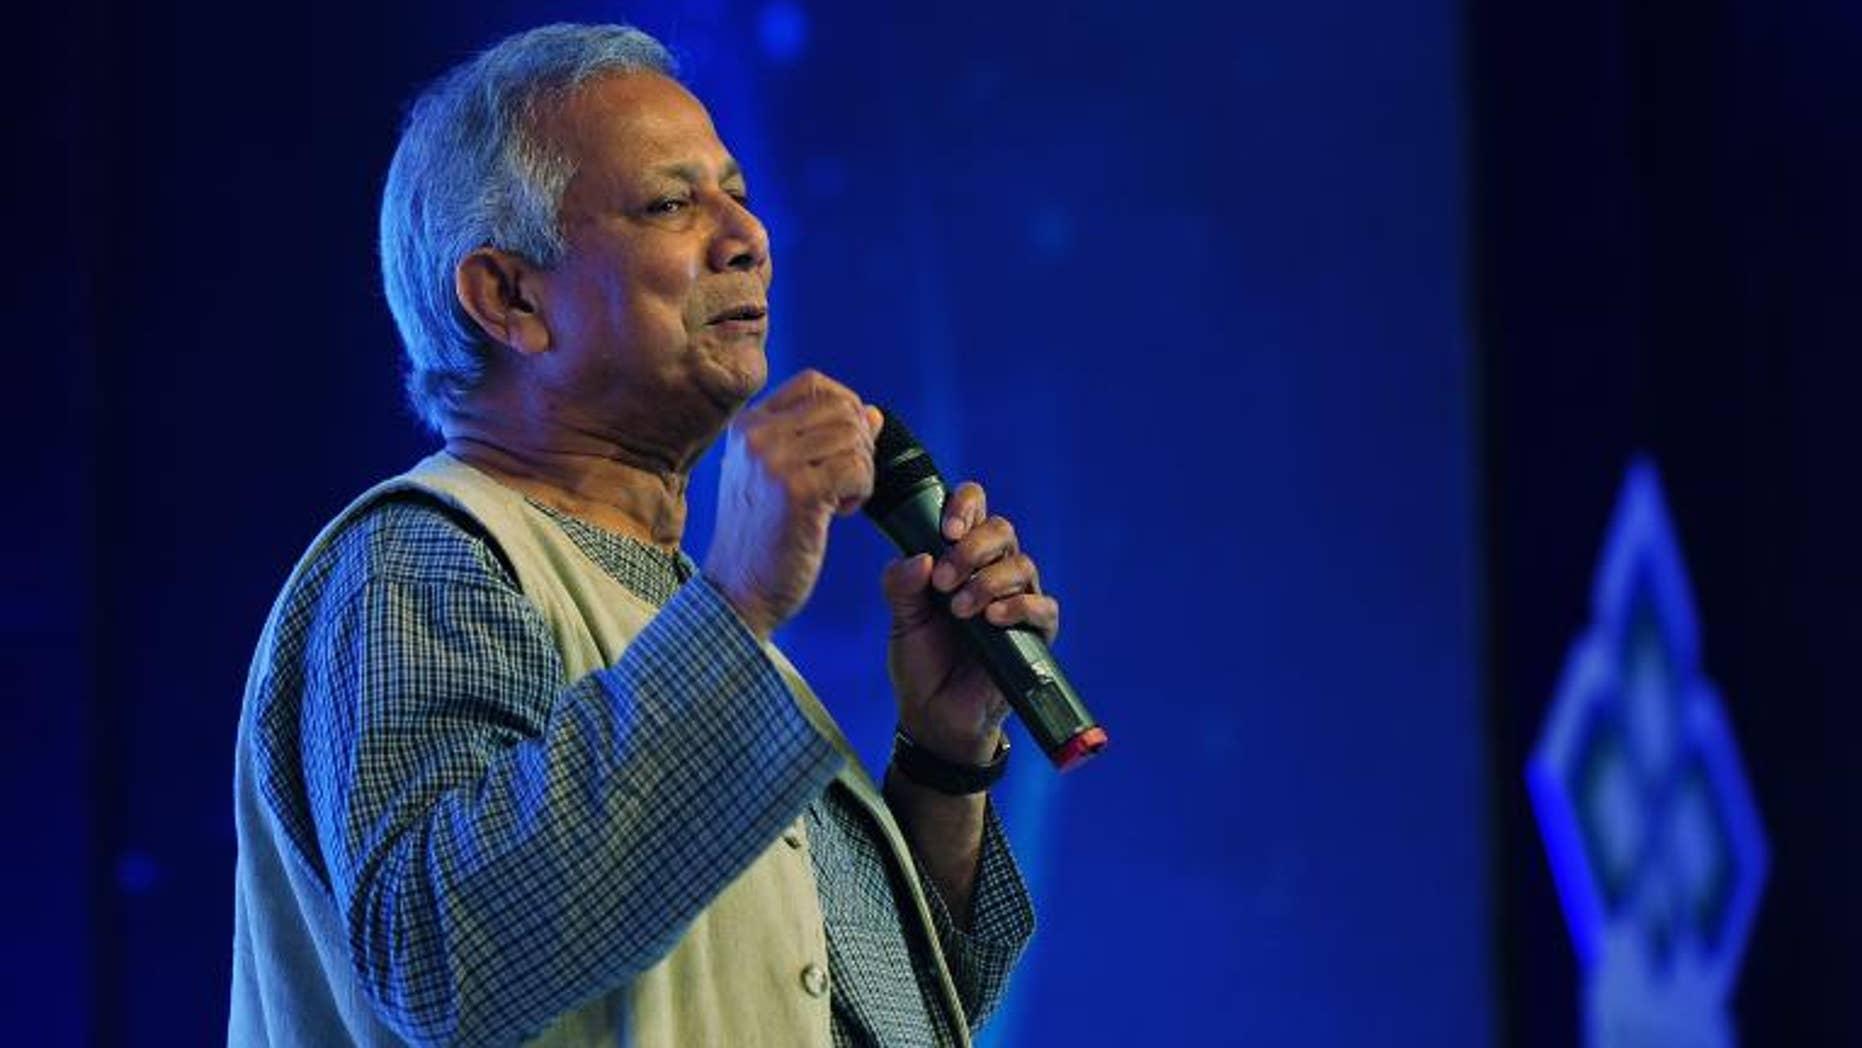 Nobel Laureate Professor Muhammad Yunus speaks during the 4th Annual Social Business Day in Dhaka on June 28, 2013